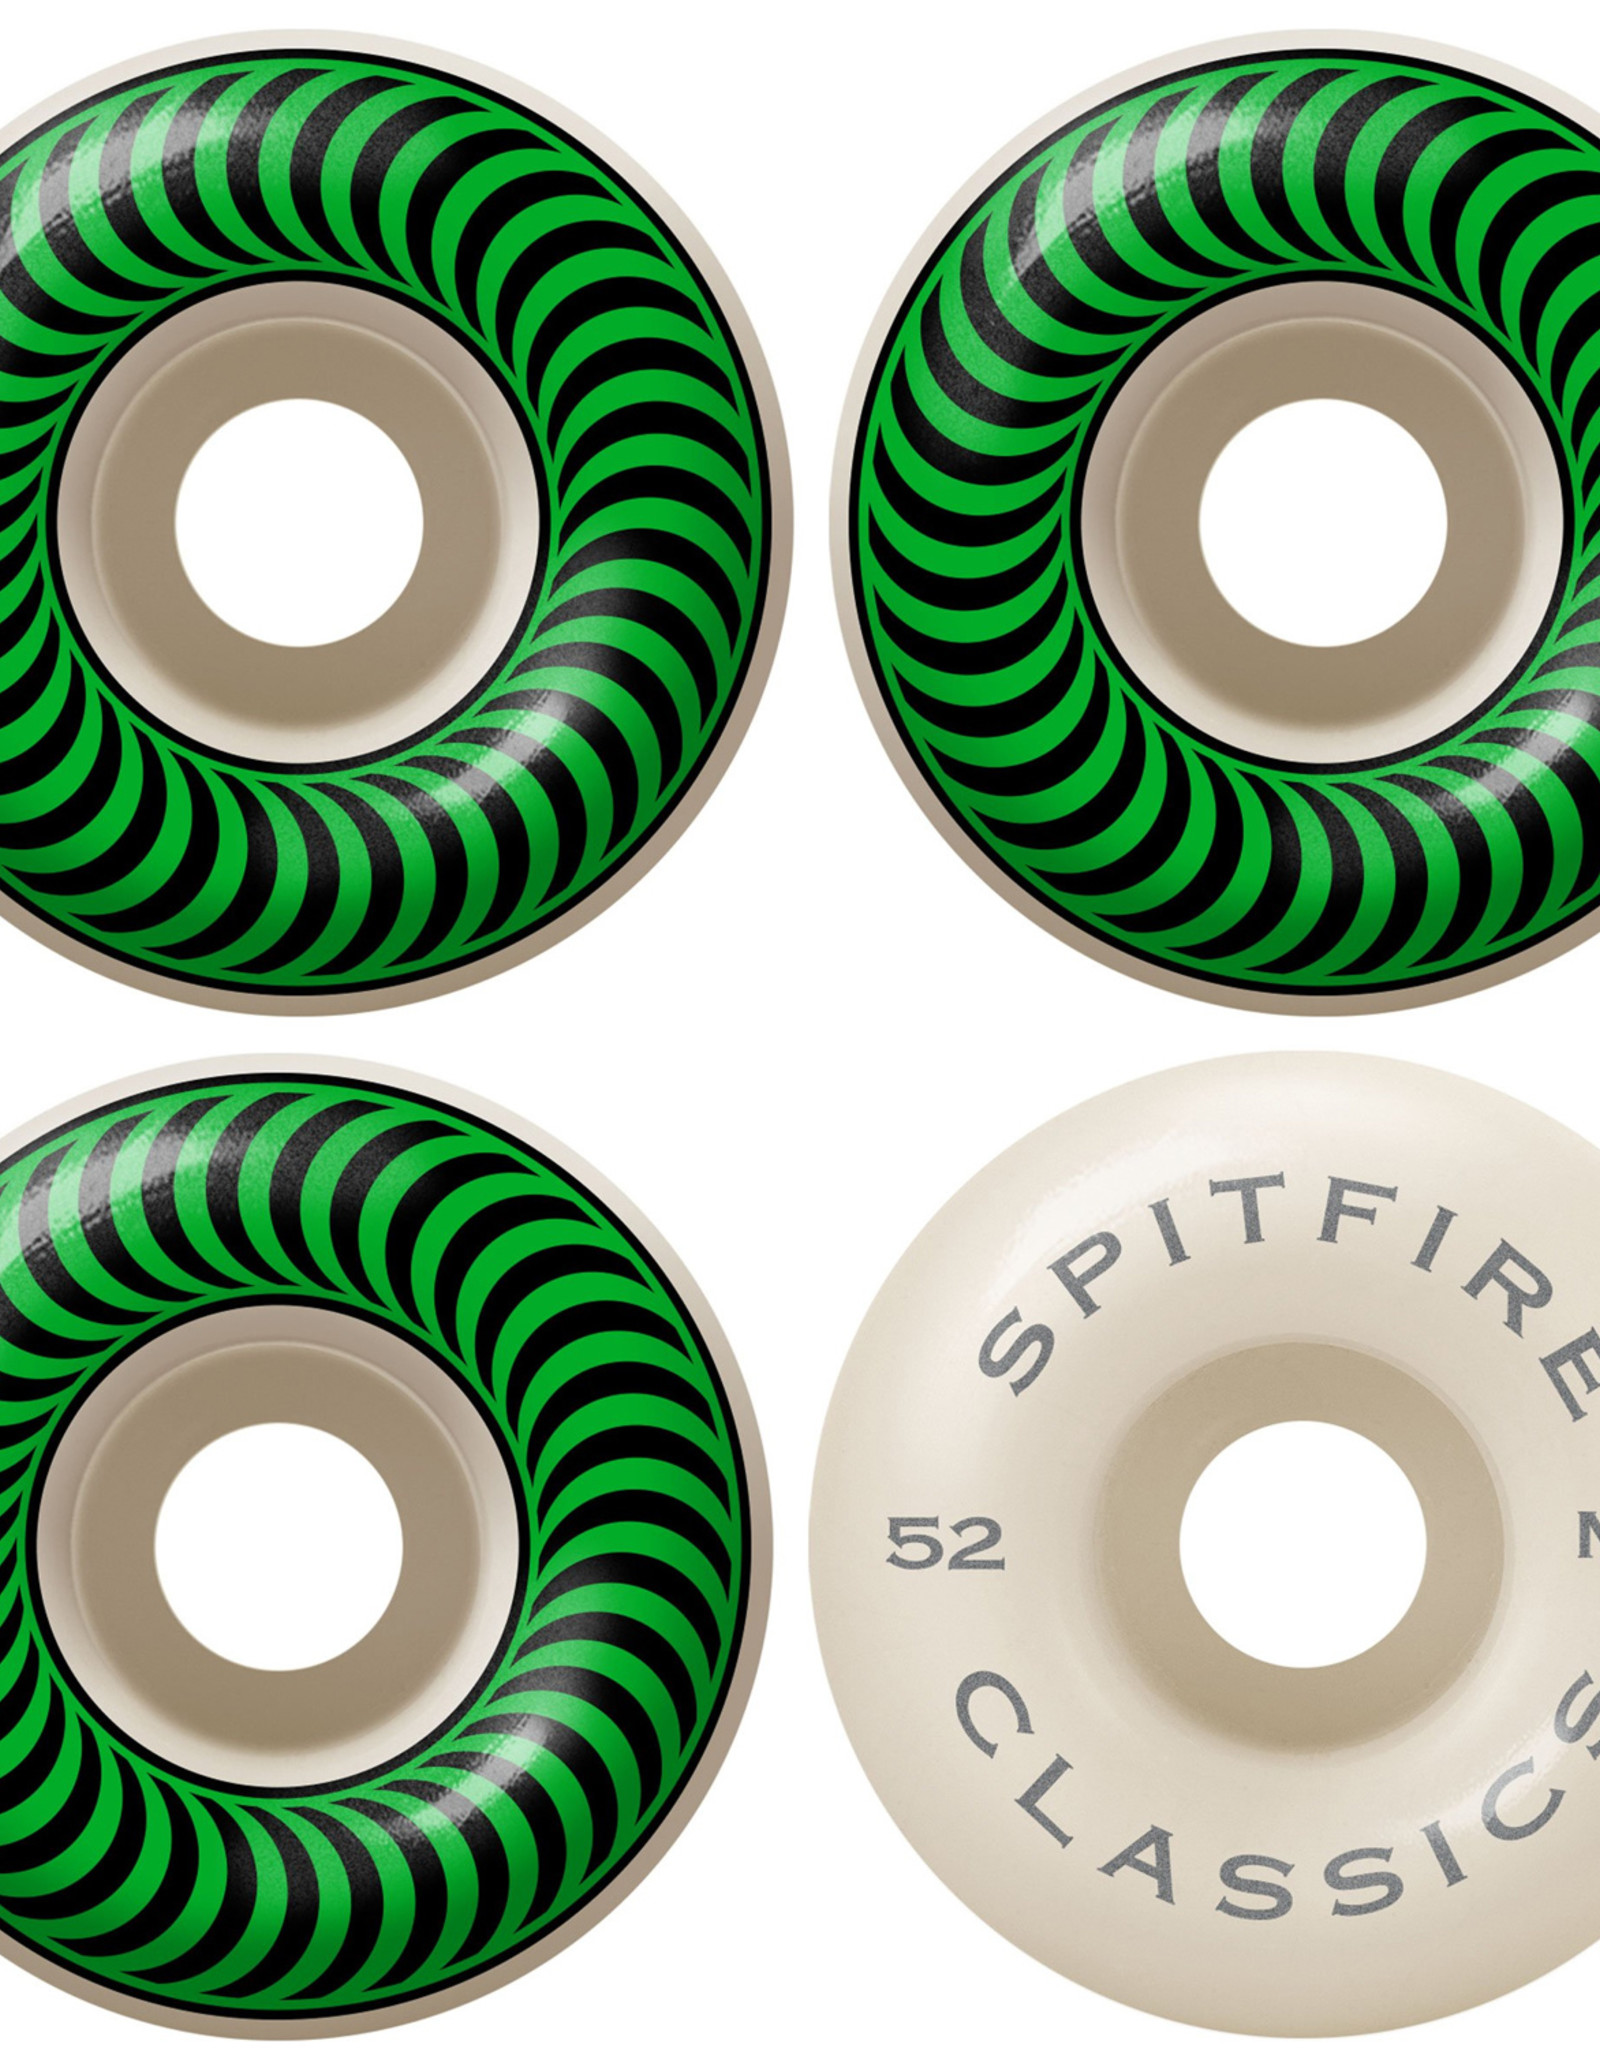 Spitfire Spitfire CLASSIC 52